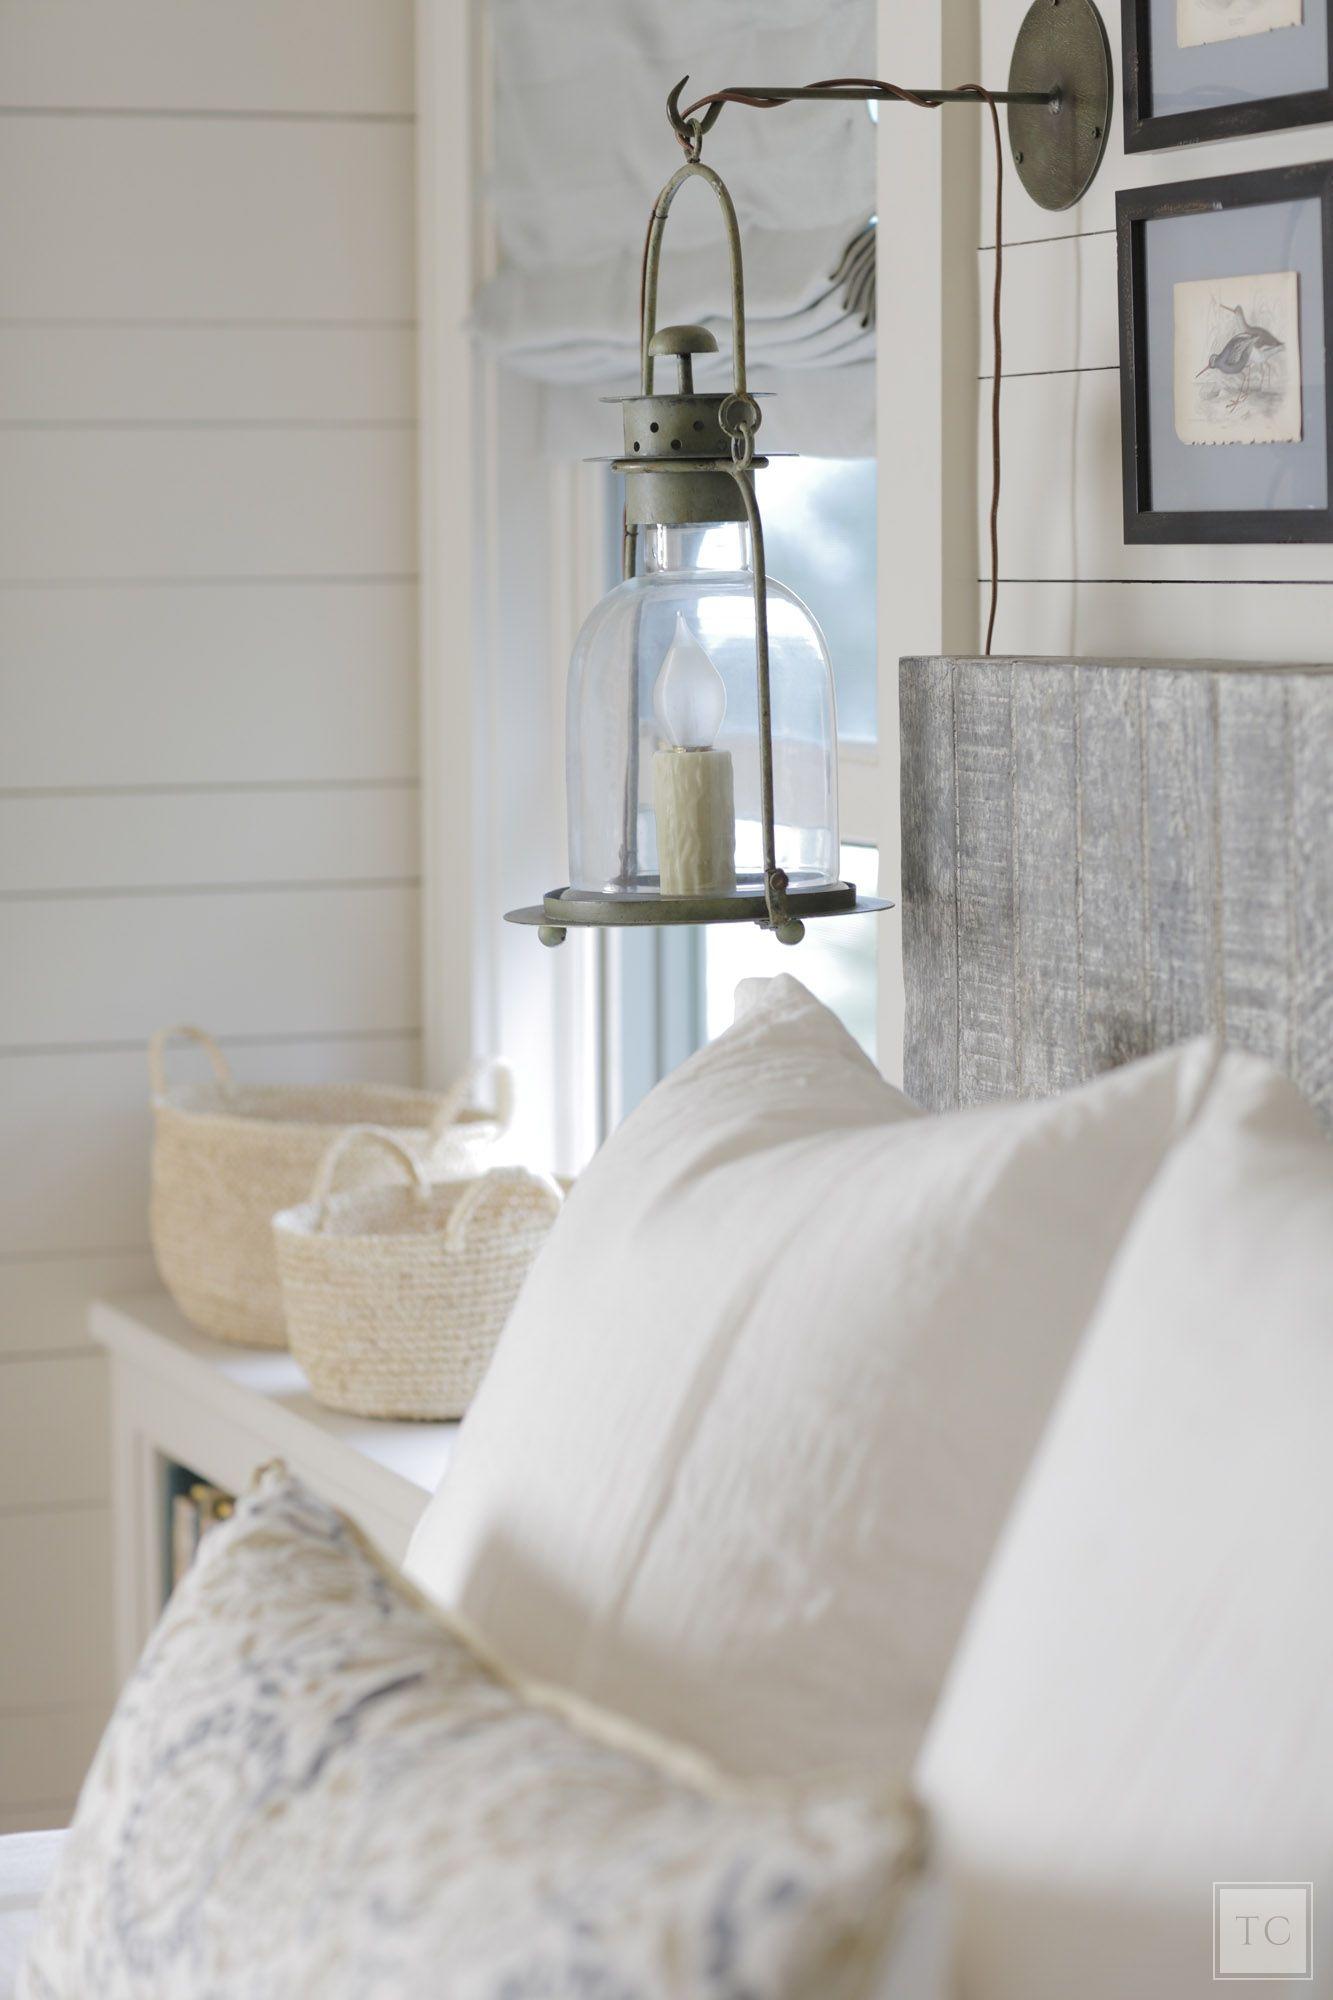 From the portfolio of tammy connor interior design